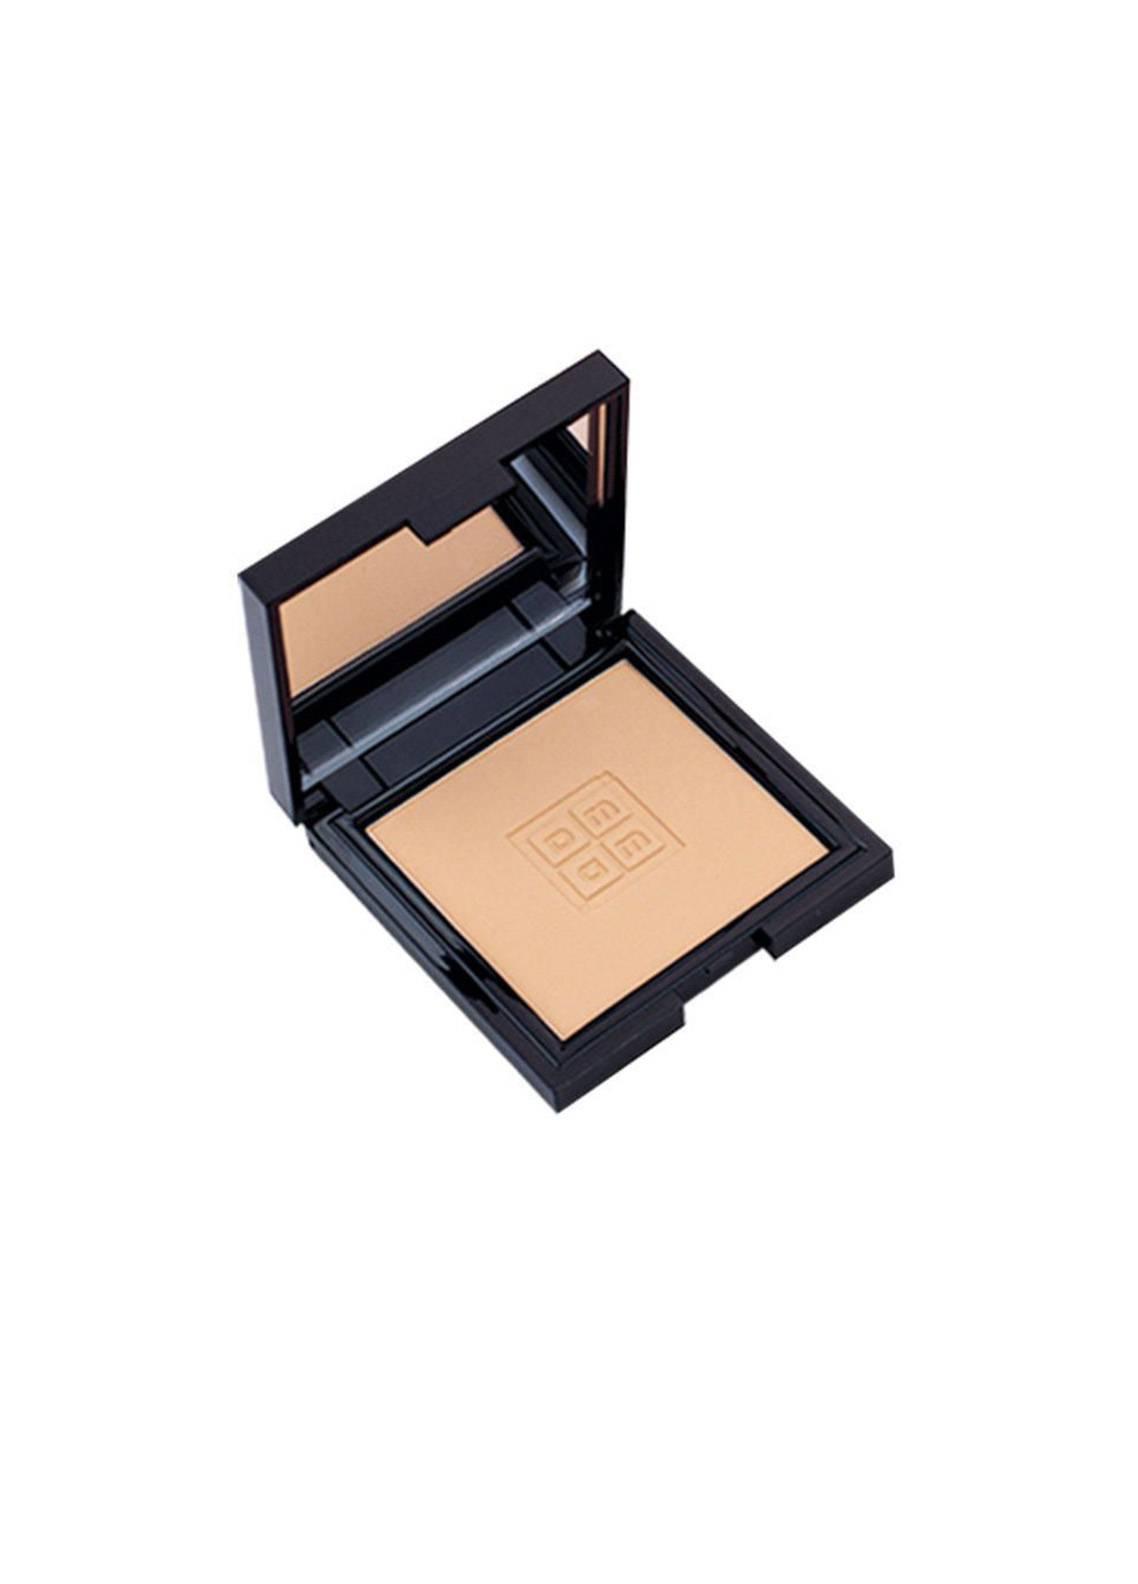 DMGM Even Complex Compact Powder - Rich Tan - 06